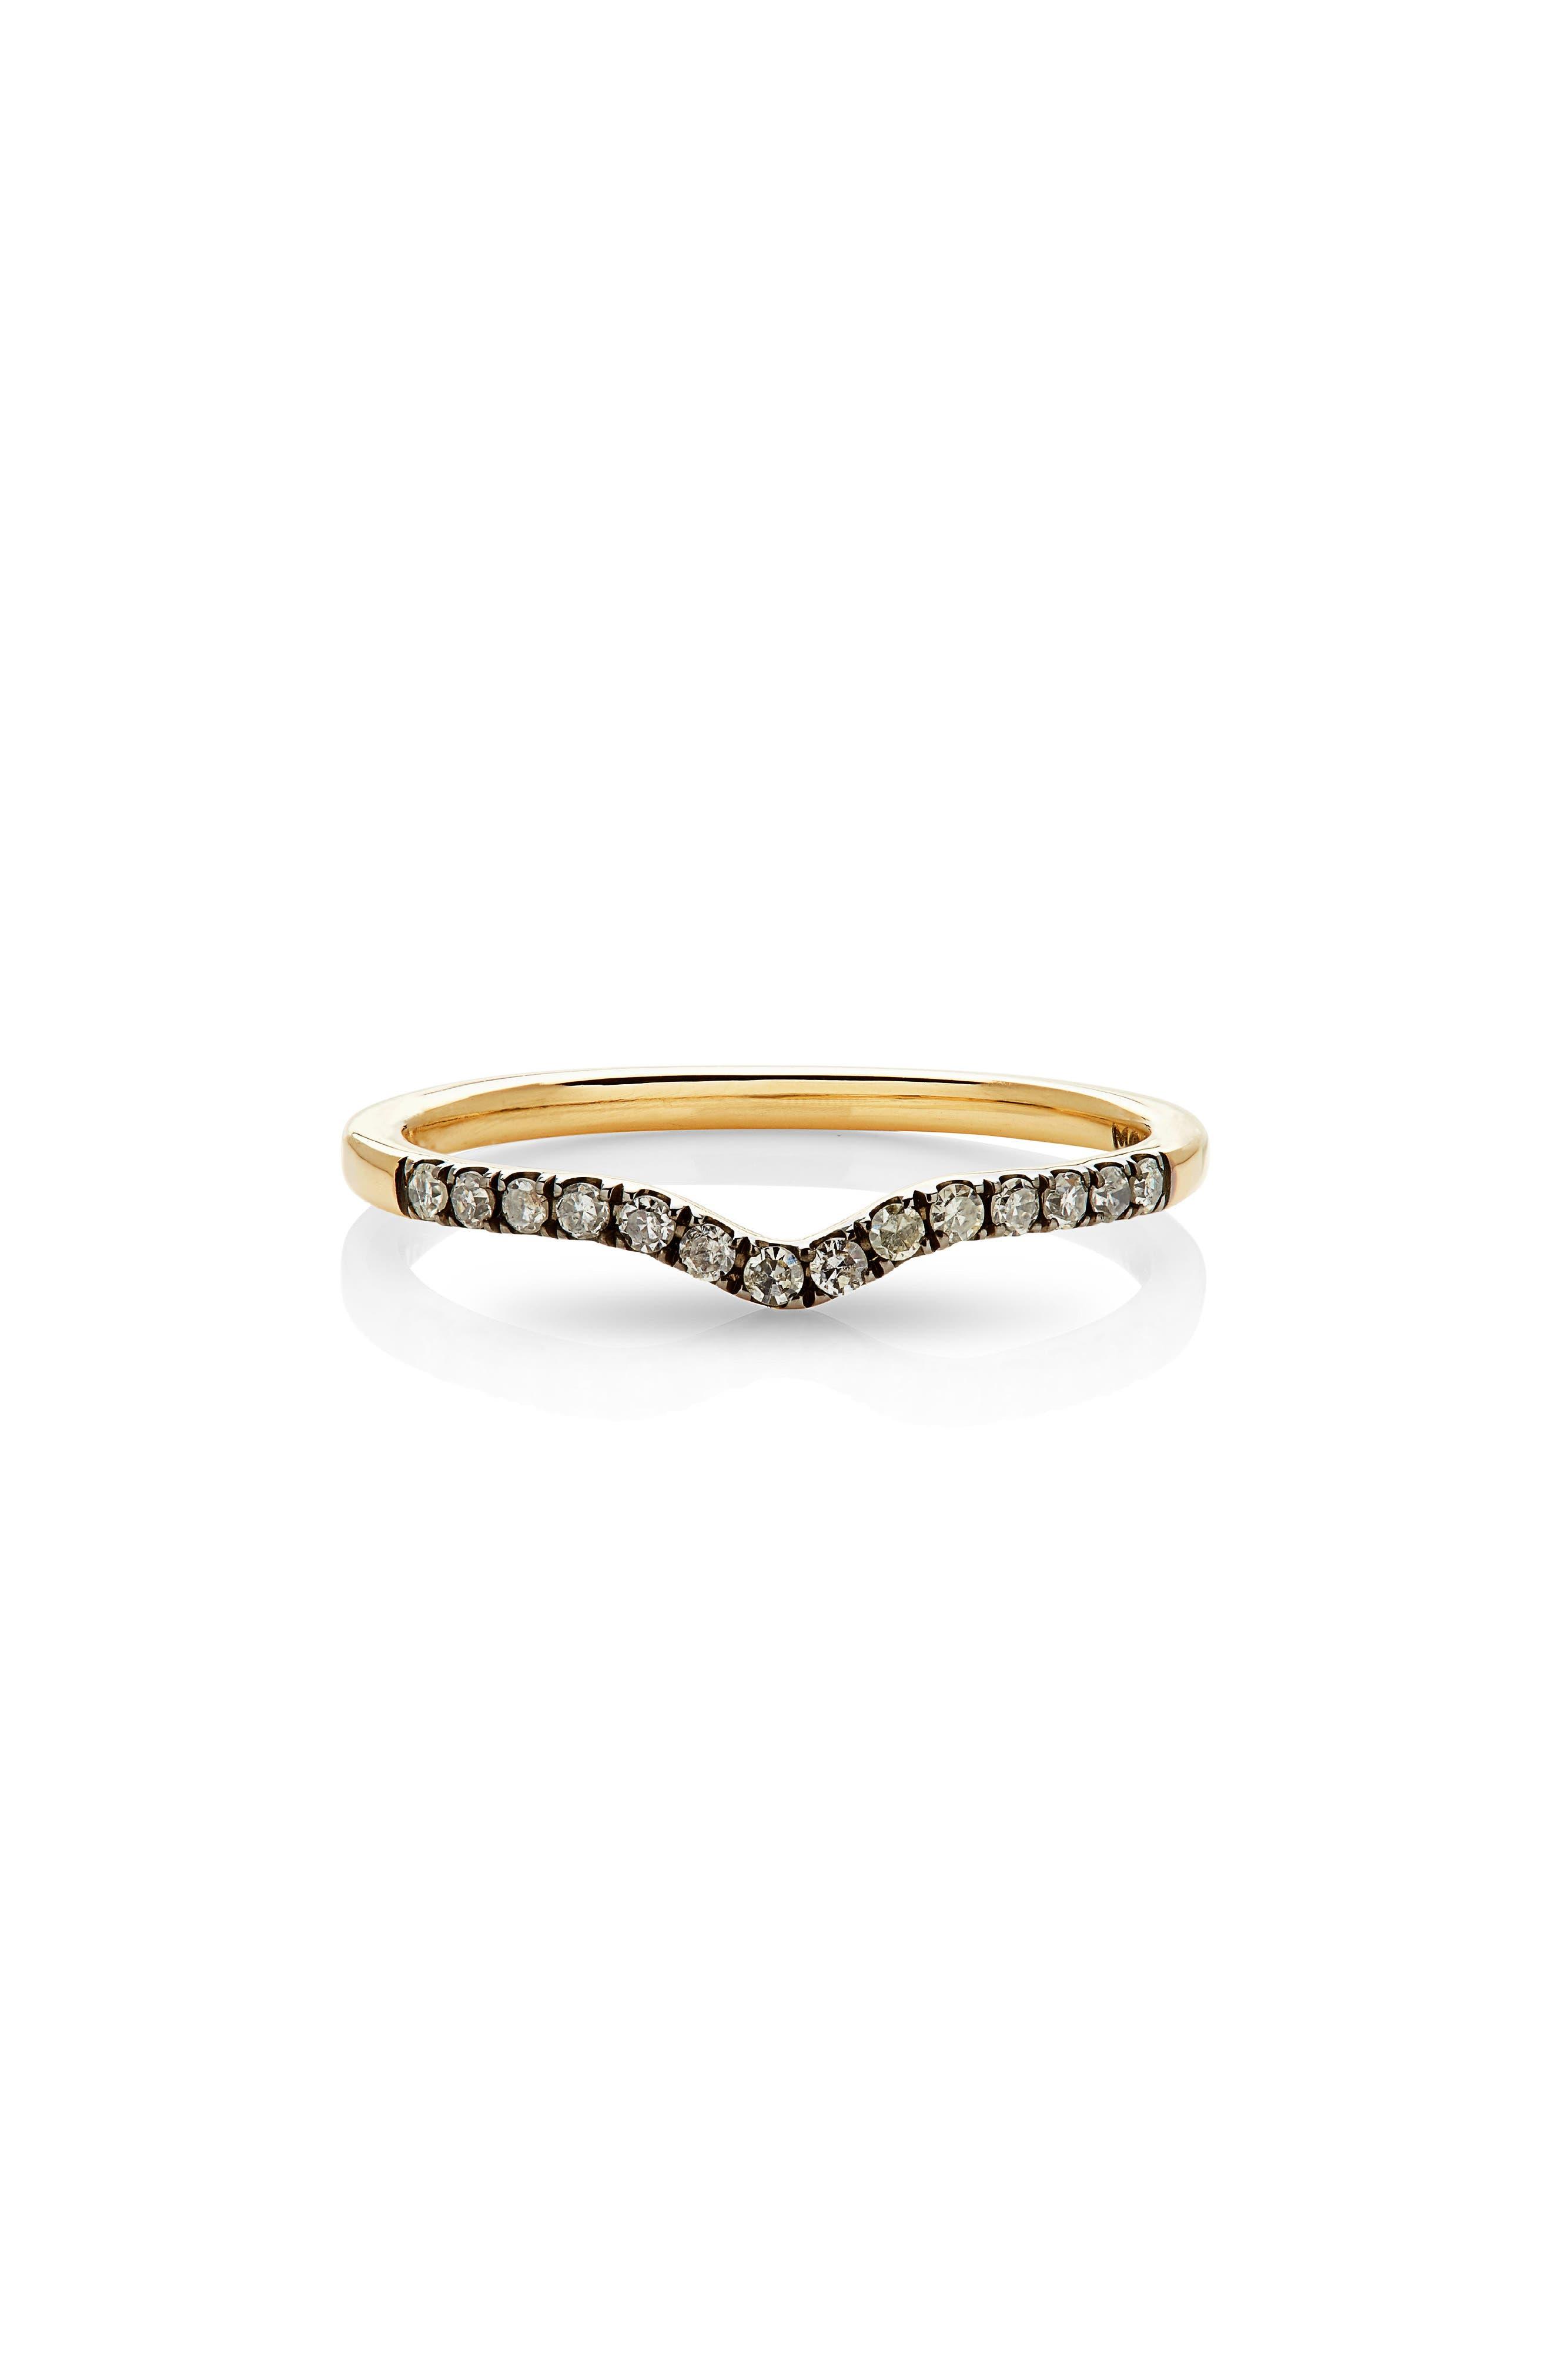 Unity Diamond Band Ring,                             Alternate thumbnail 2, color,                             YELLOW GOLD